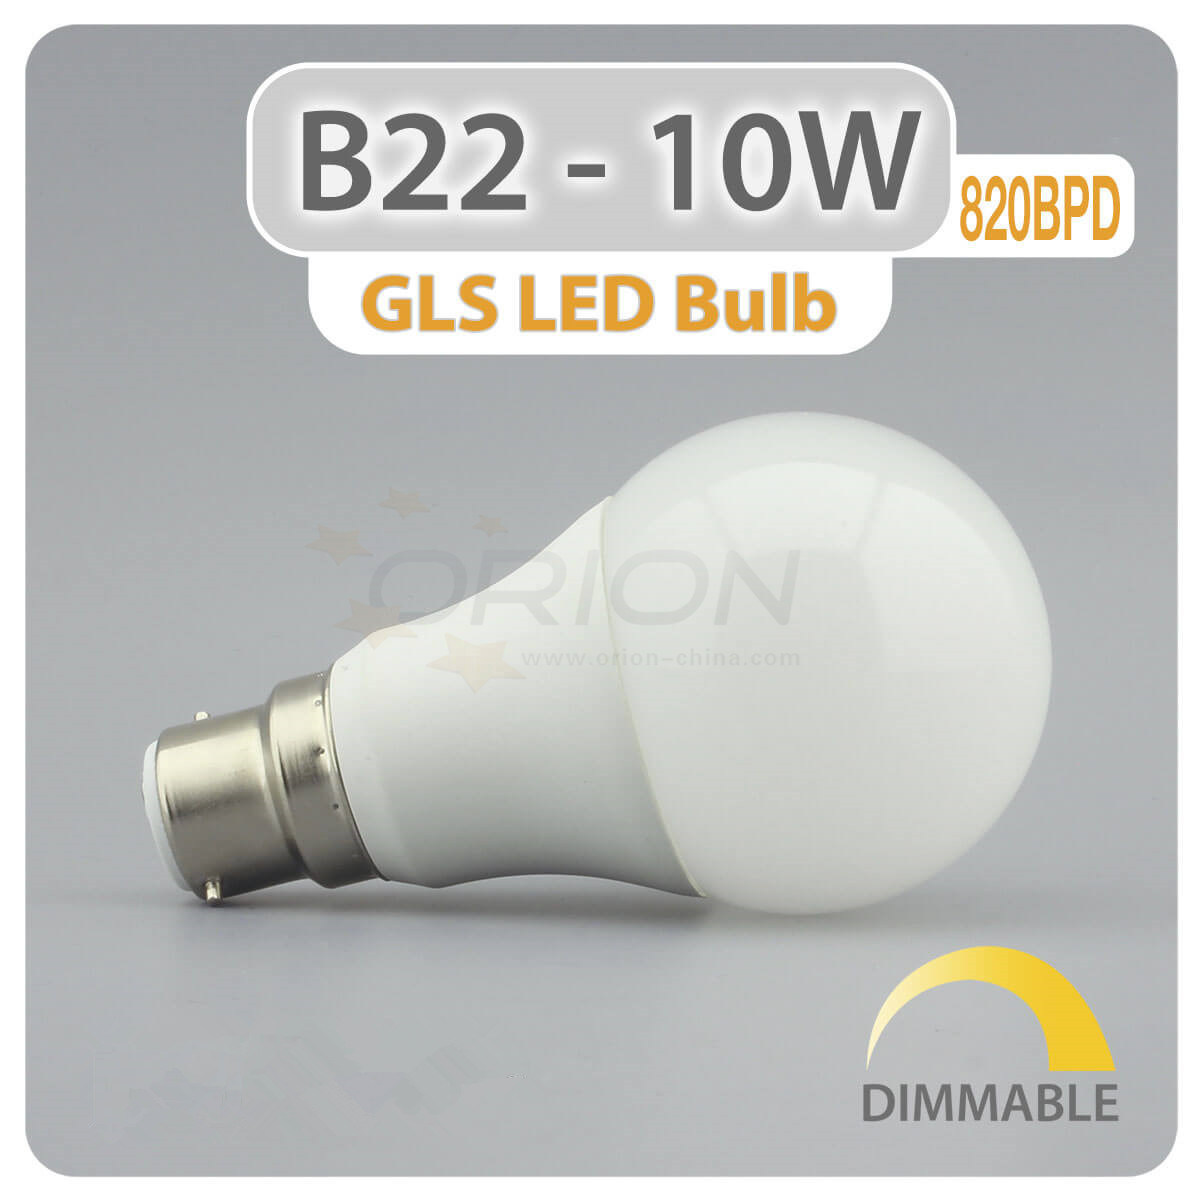 China Factory Price 10 Watt LED Light Bulb for Home Lighting Photos ...